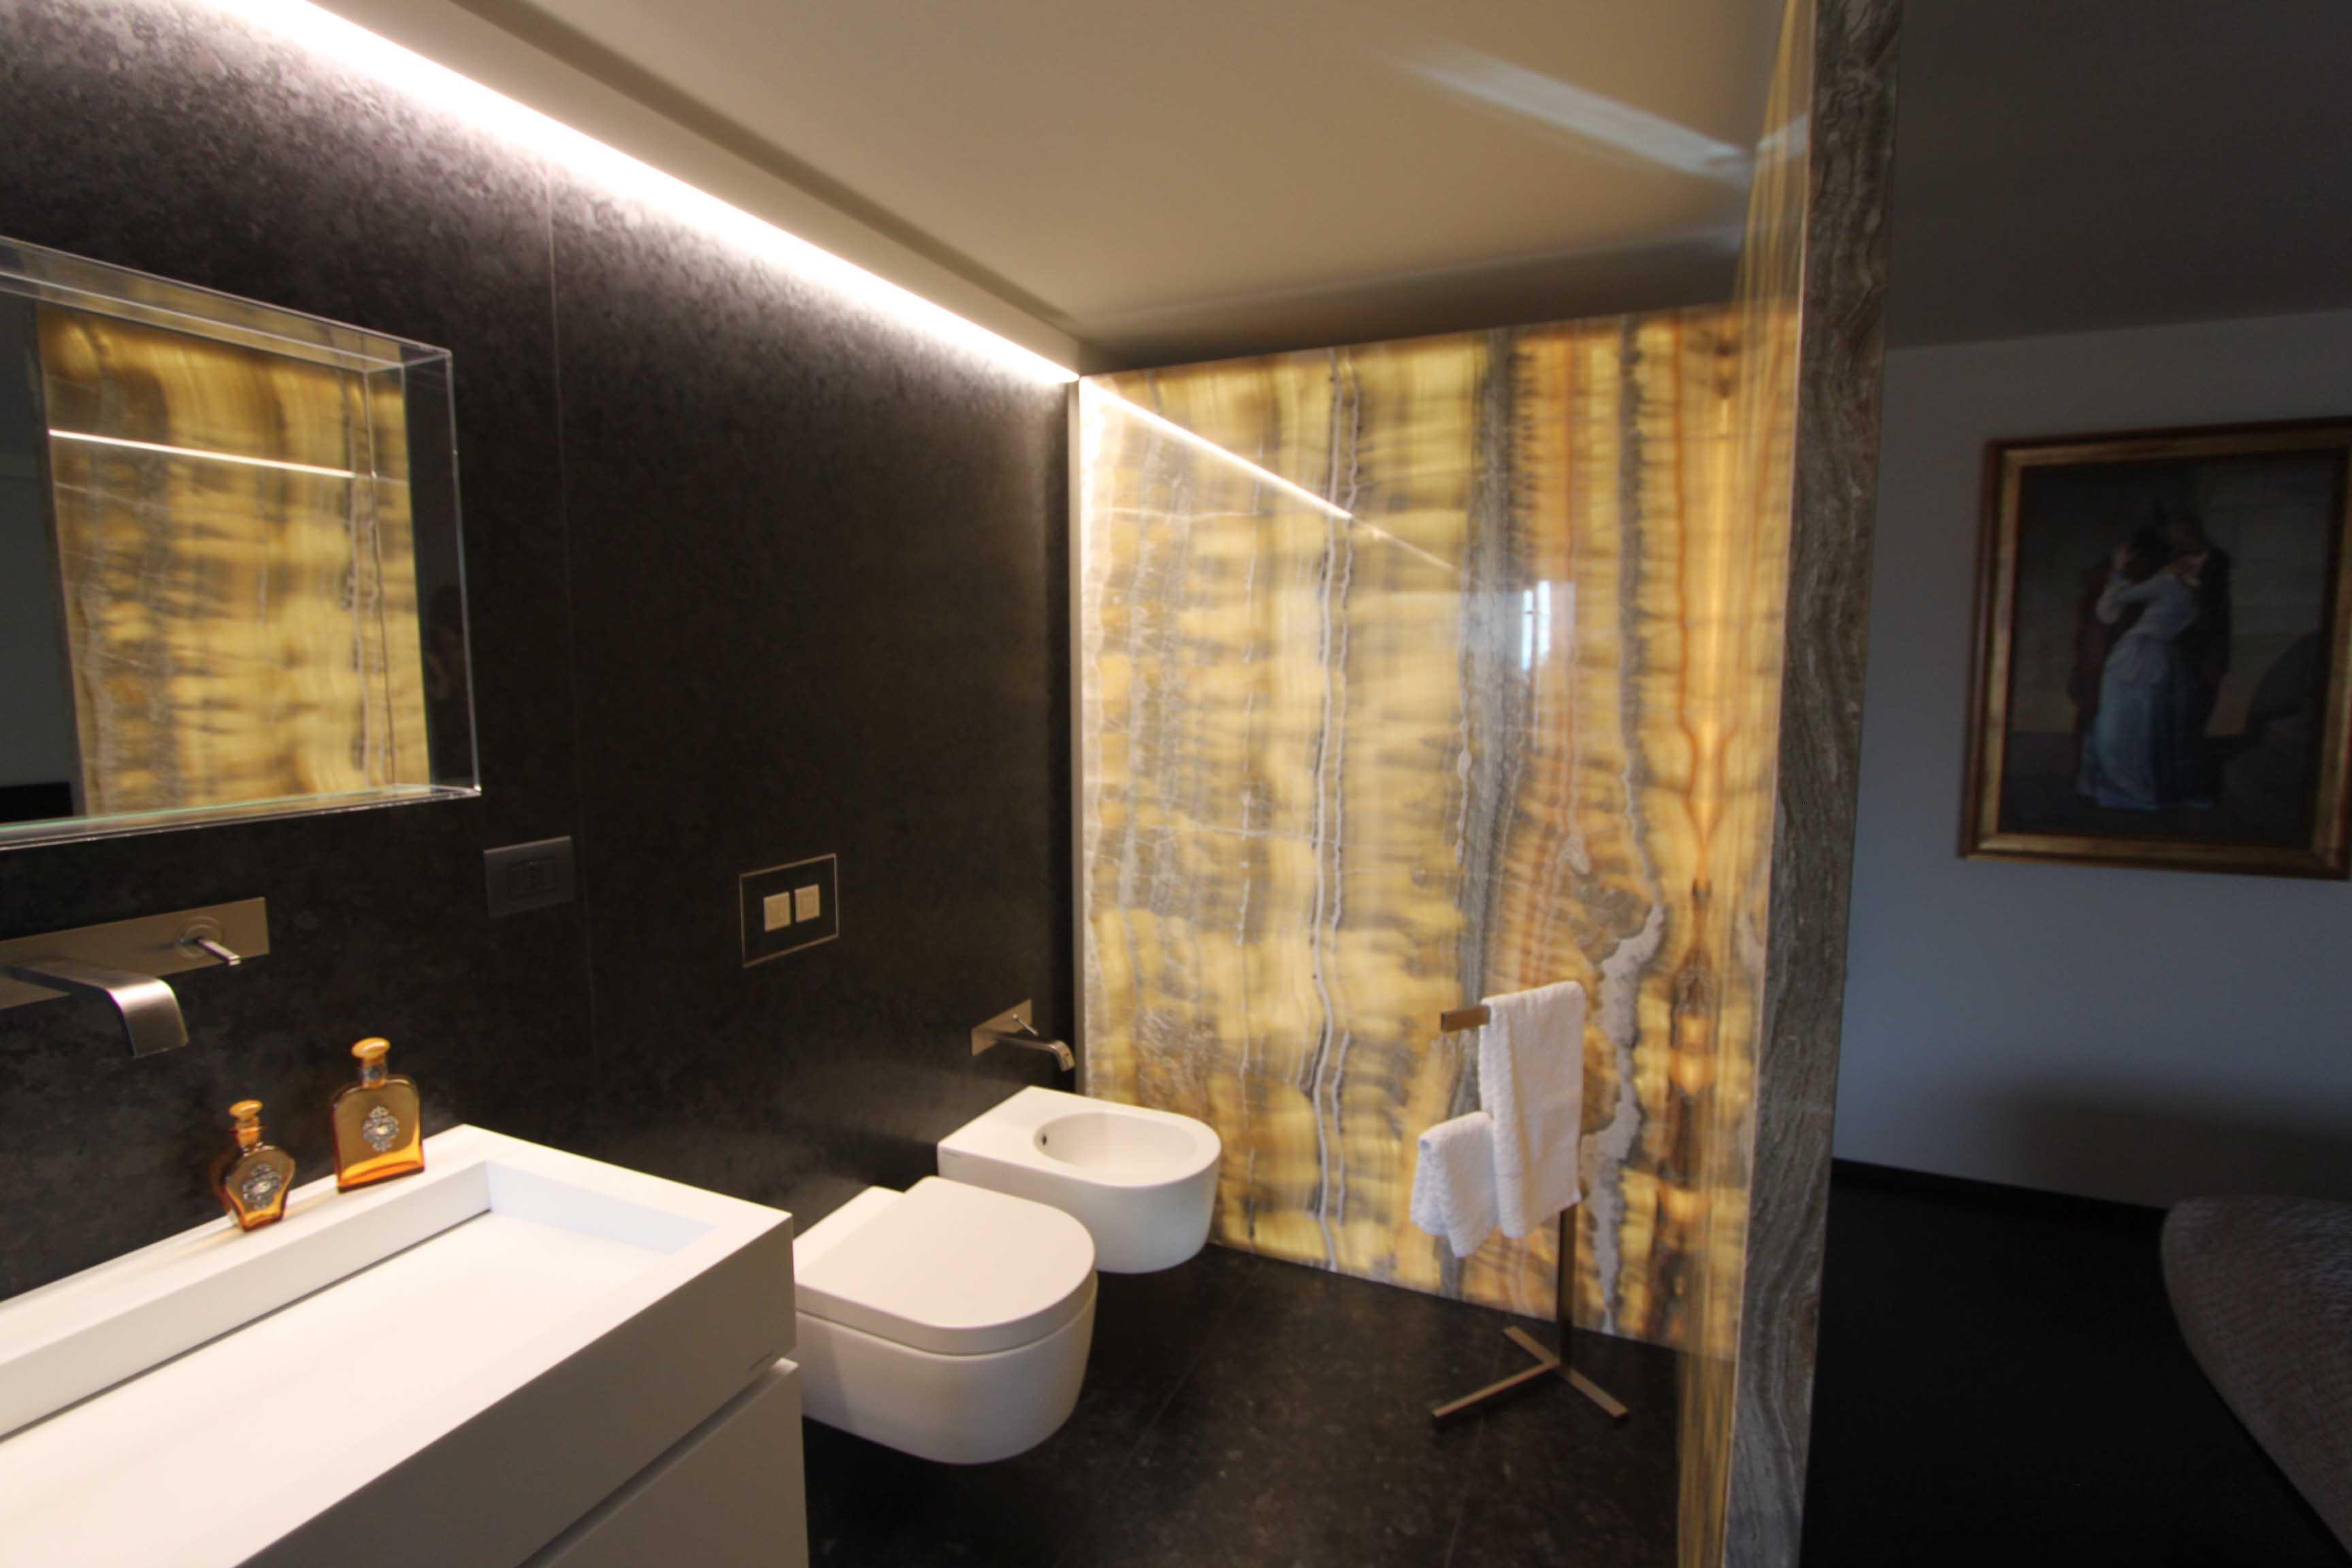 studio_balini_architettura_bergamo 26